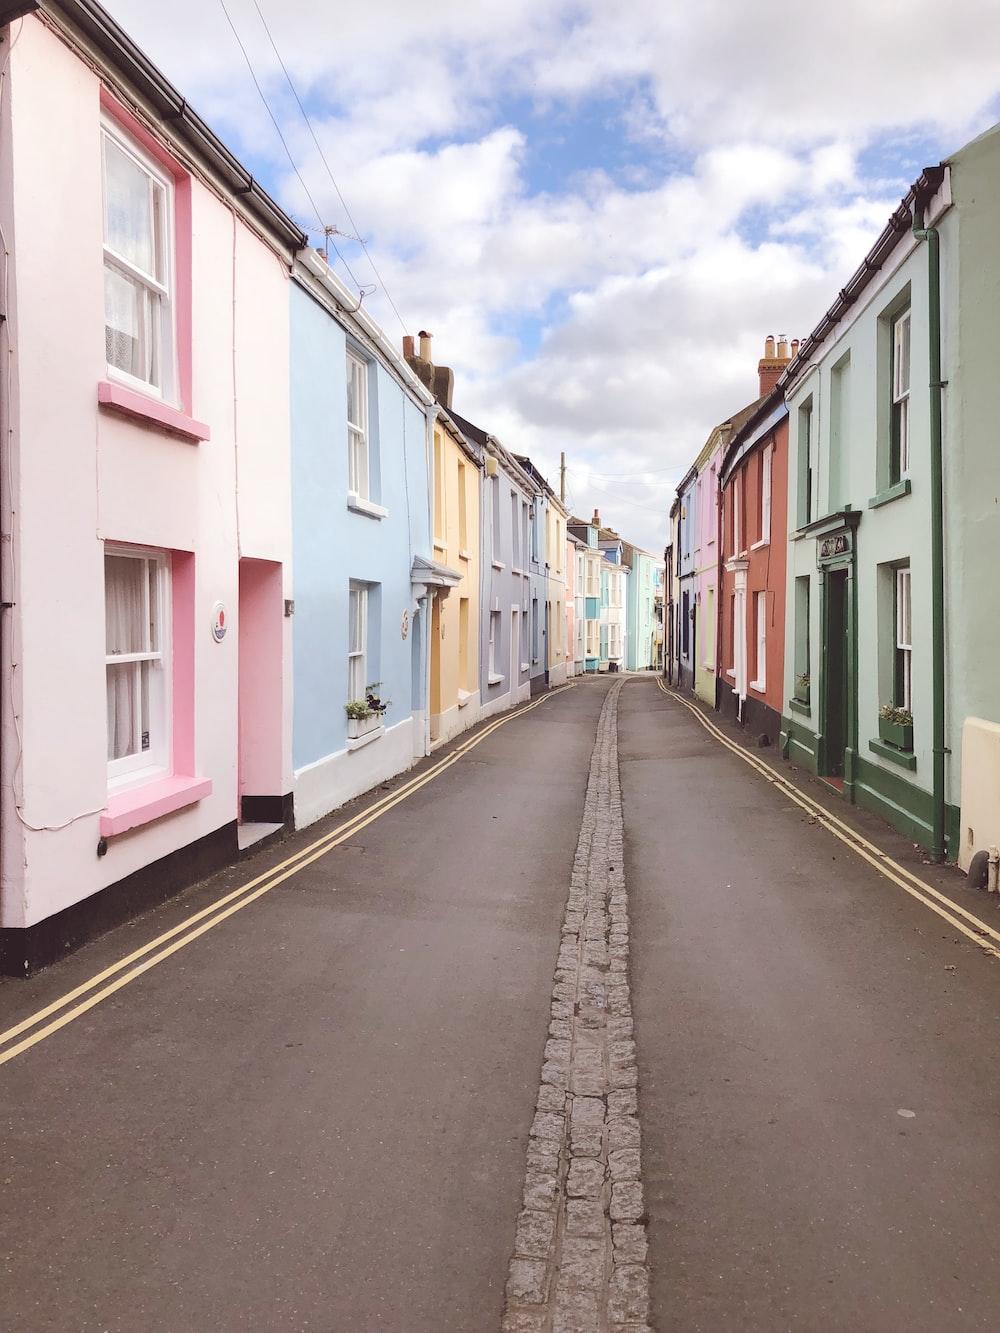 assorted-color concrete houses